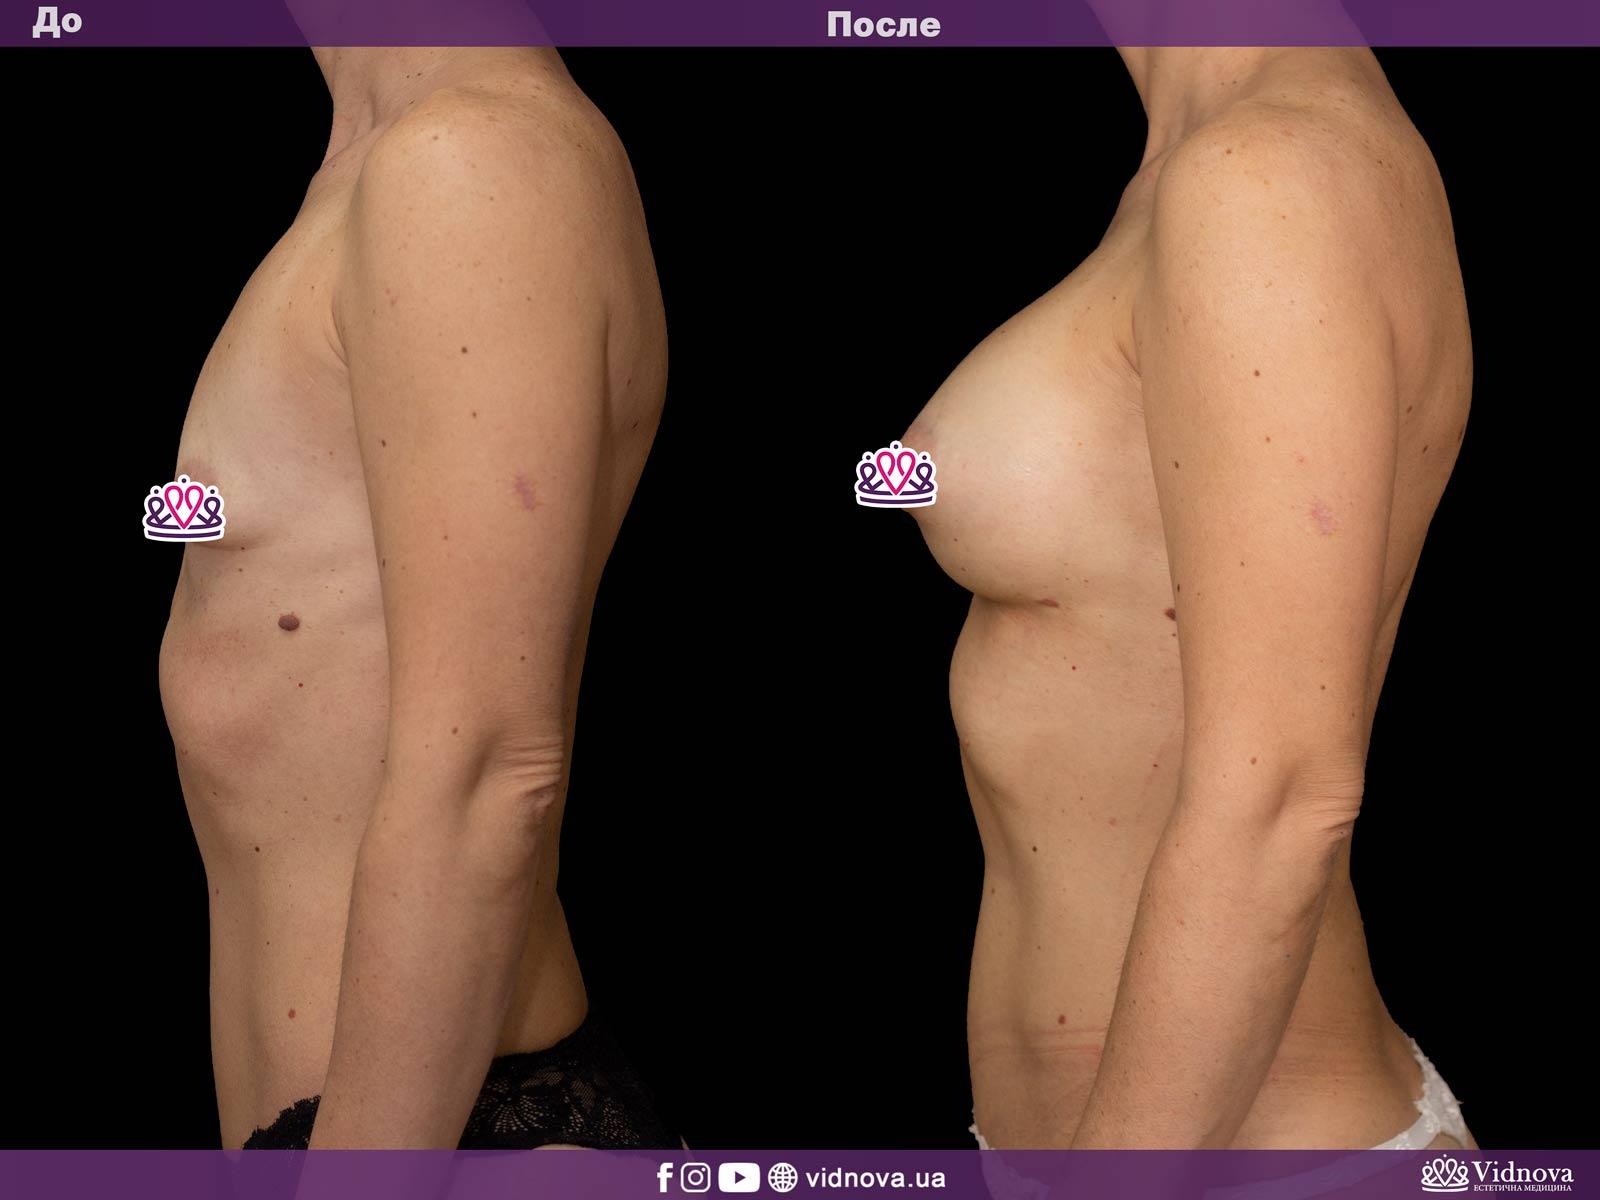 Увеличение груди: Фото ДО и ПОСЛЕ - Пример №26-3 - Клиника Vidnova